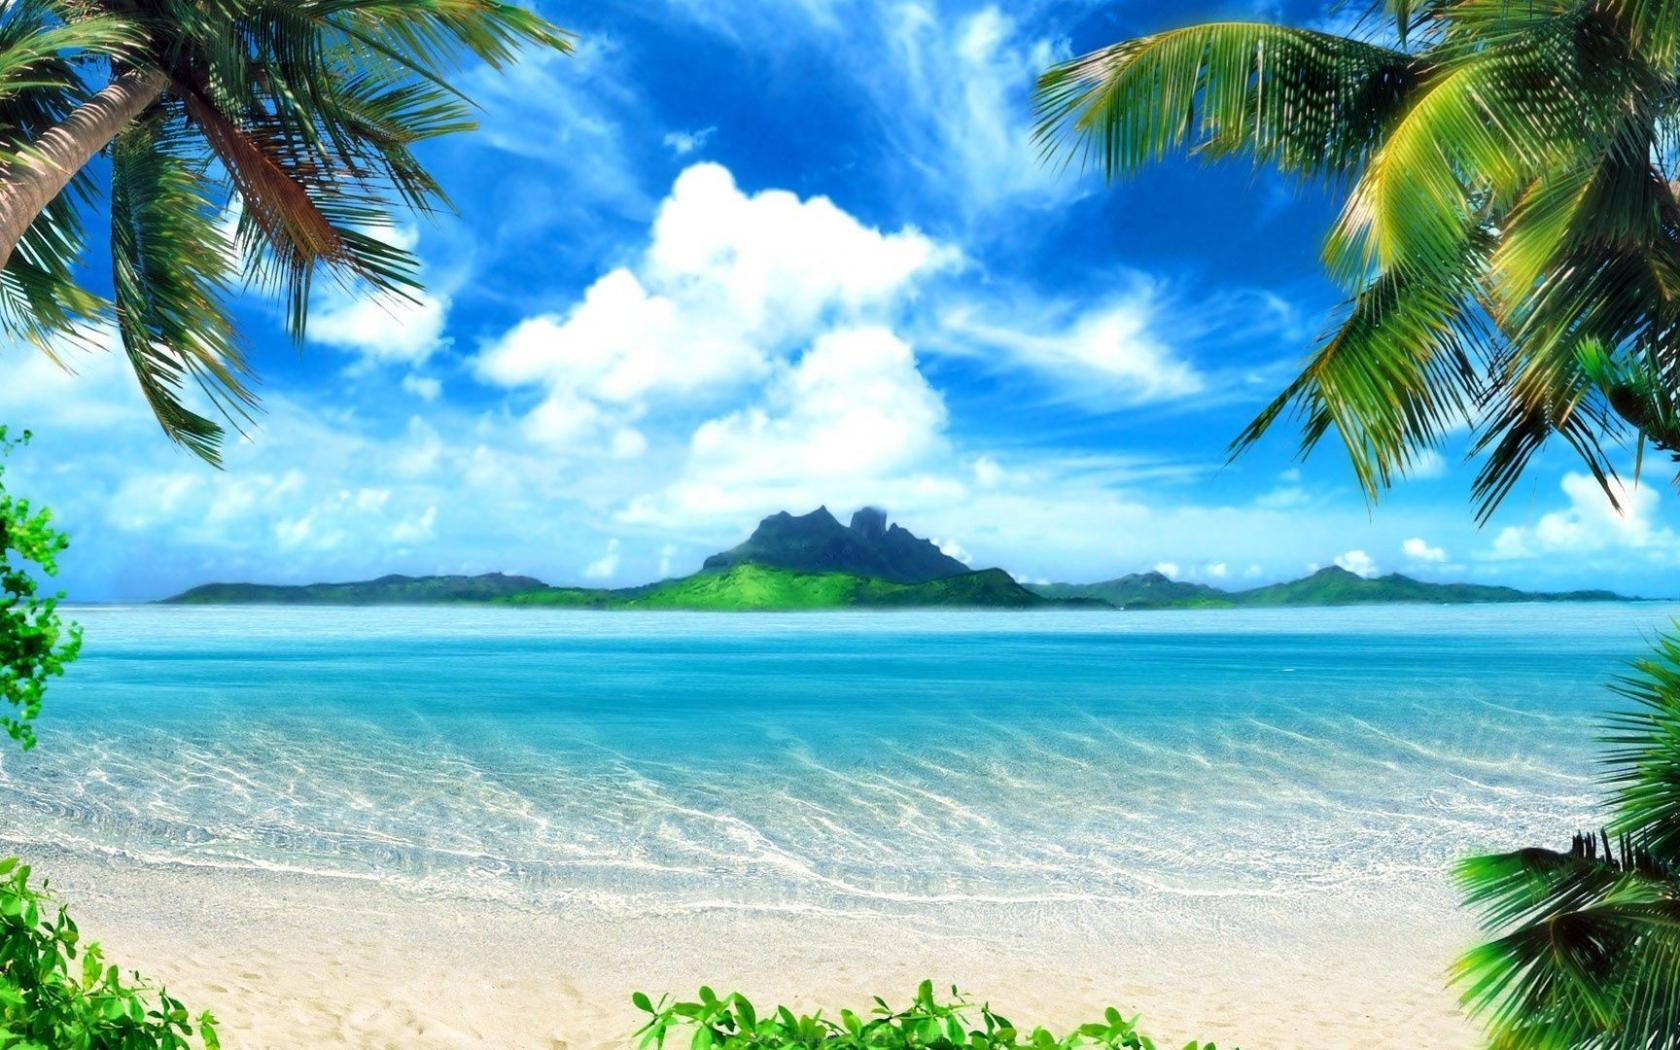 Hd Tropical Island Beach Paradise Wallpapers And Backgrounds: HD Tropical Wallpaper 1680x1050